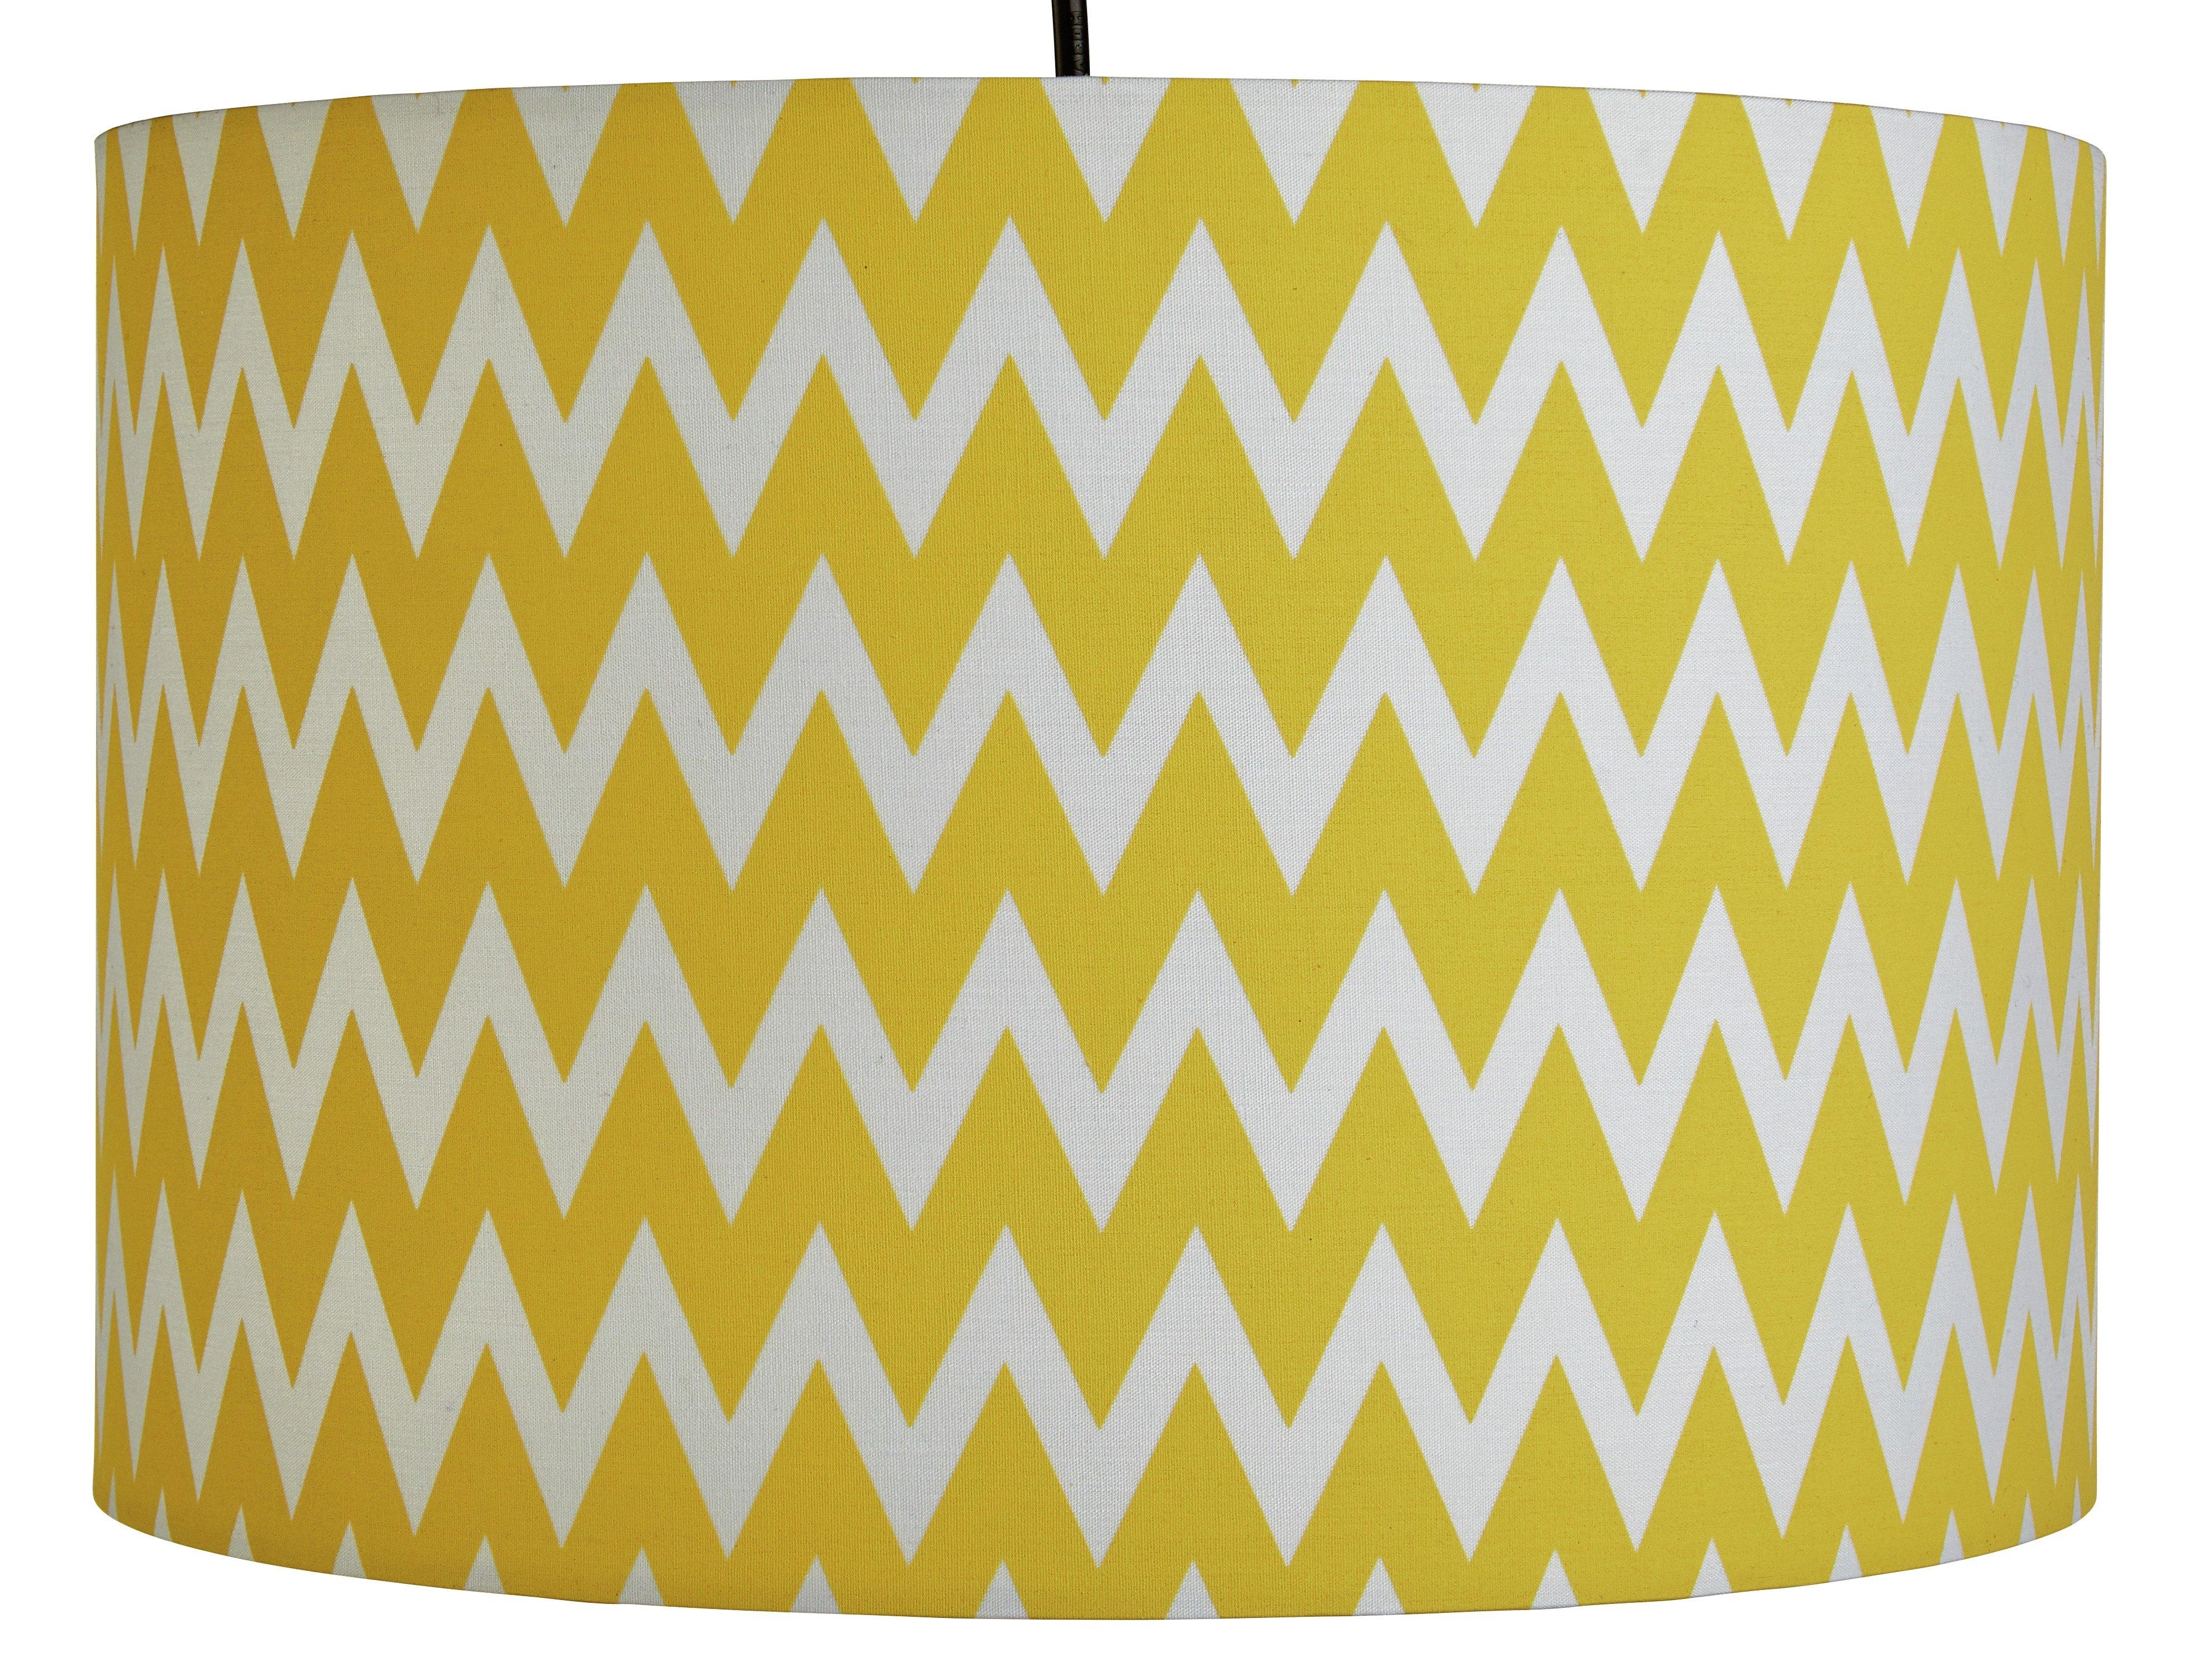 Argos Home Wave Pendant Light Shade - Yellow & White